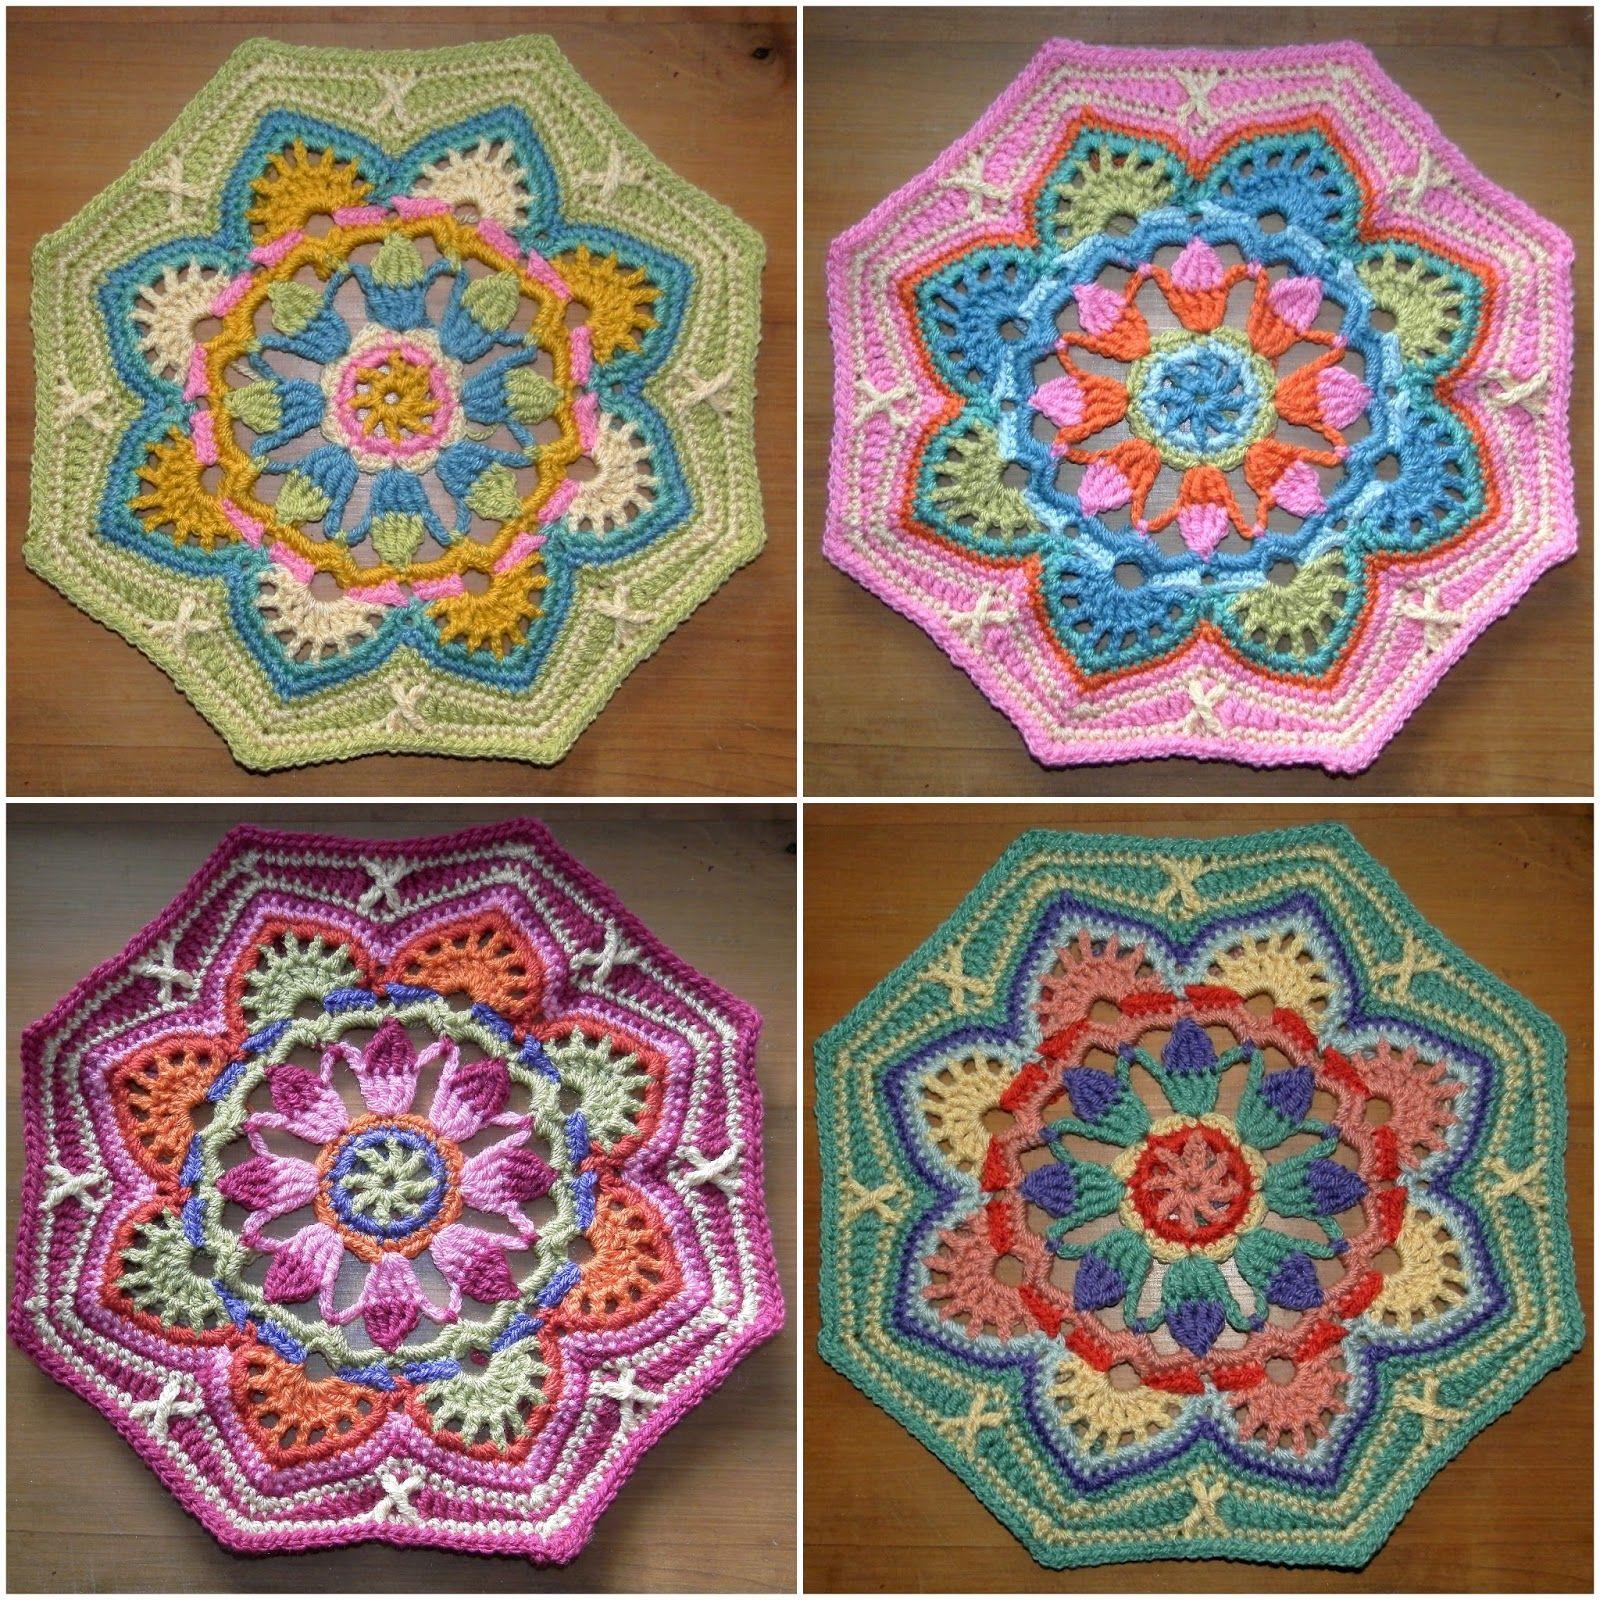 Persian Tiles - Eastern Jewels B1-B4 - Brodeuse Bressane ...